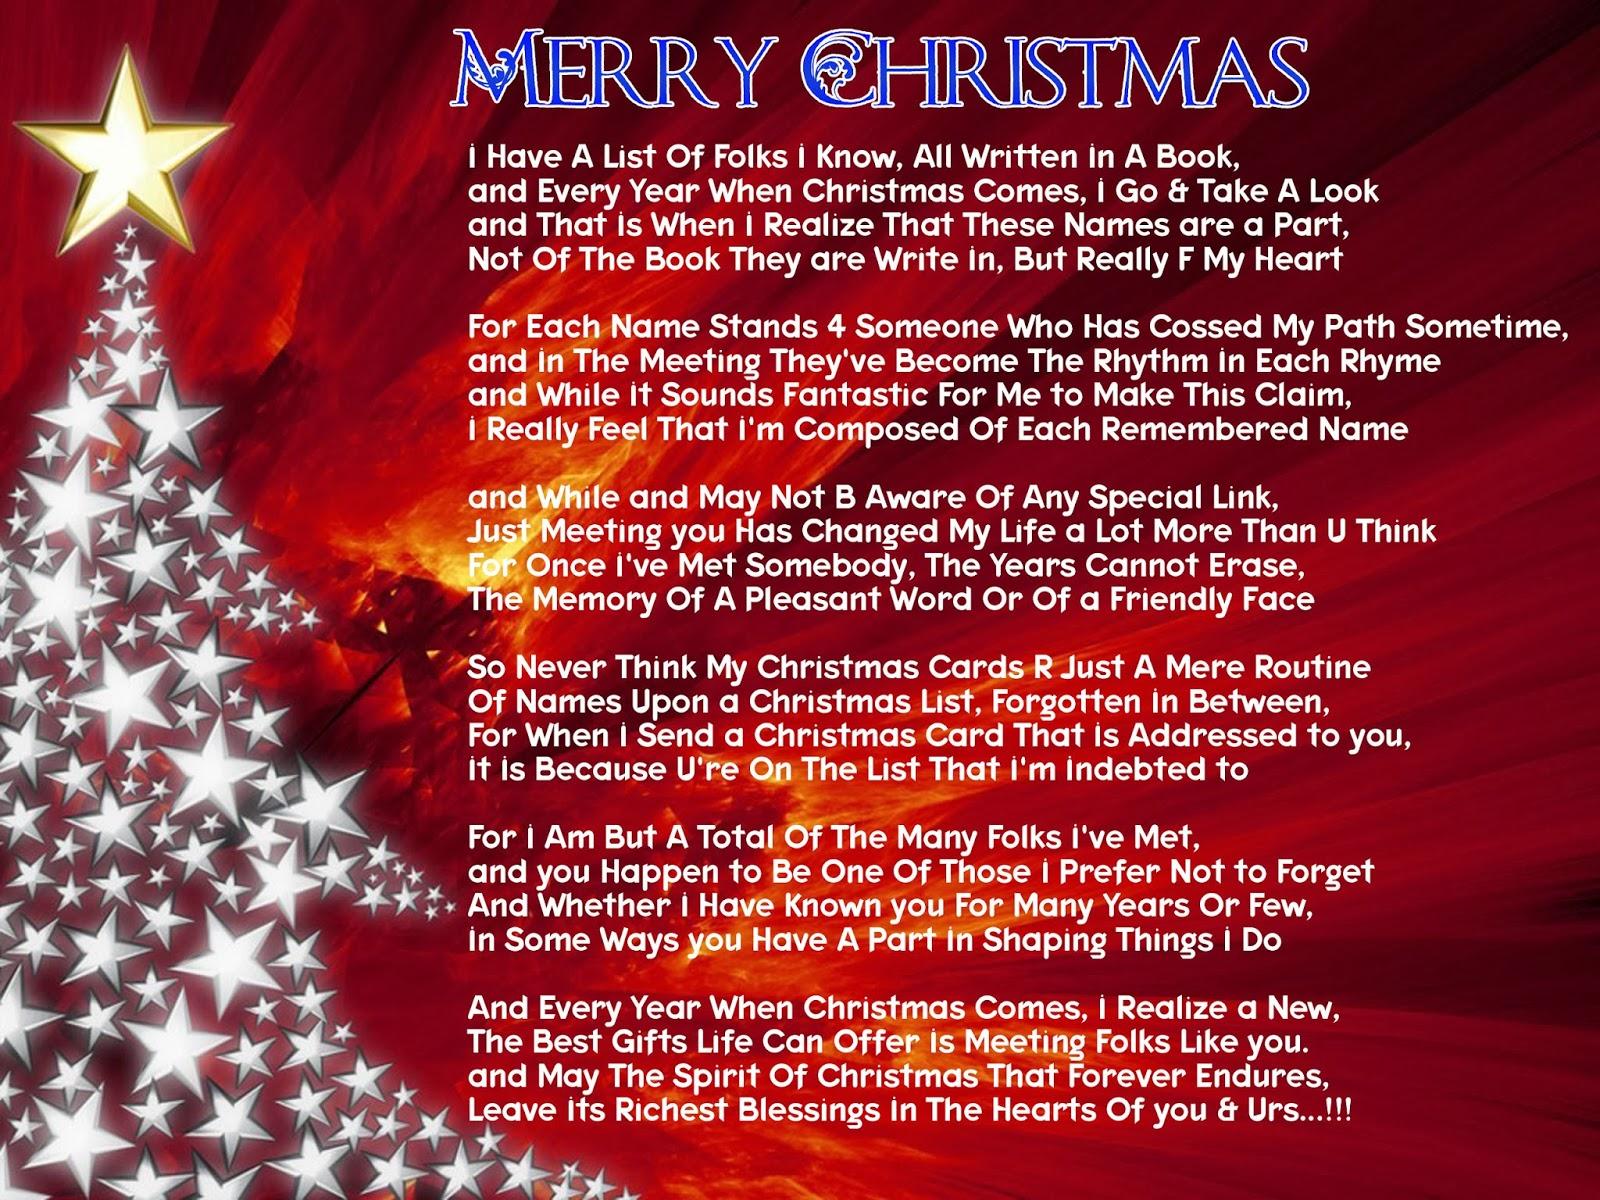 Merry Christmas Best Friend Poem